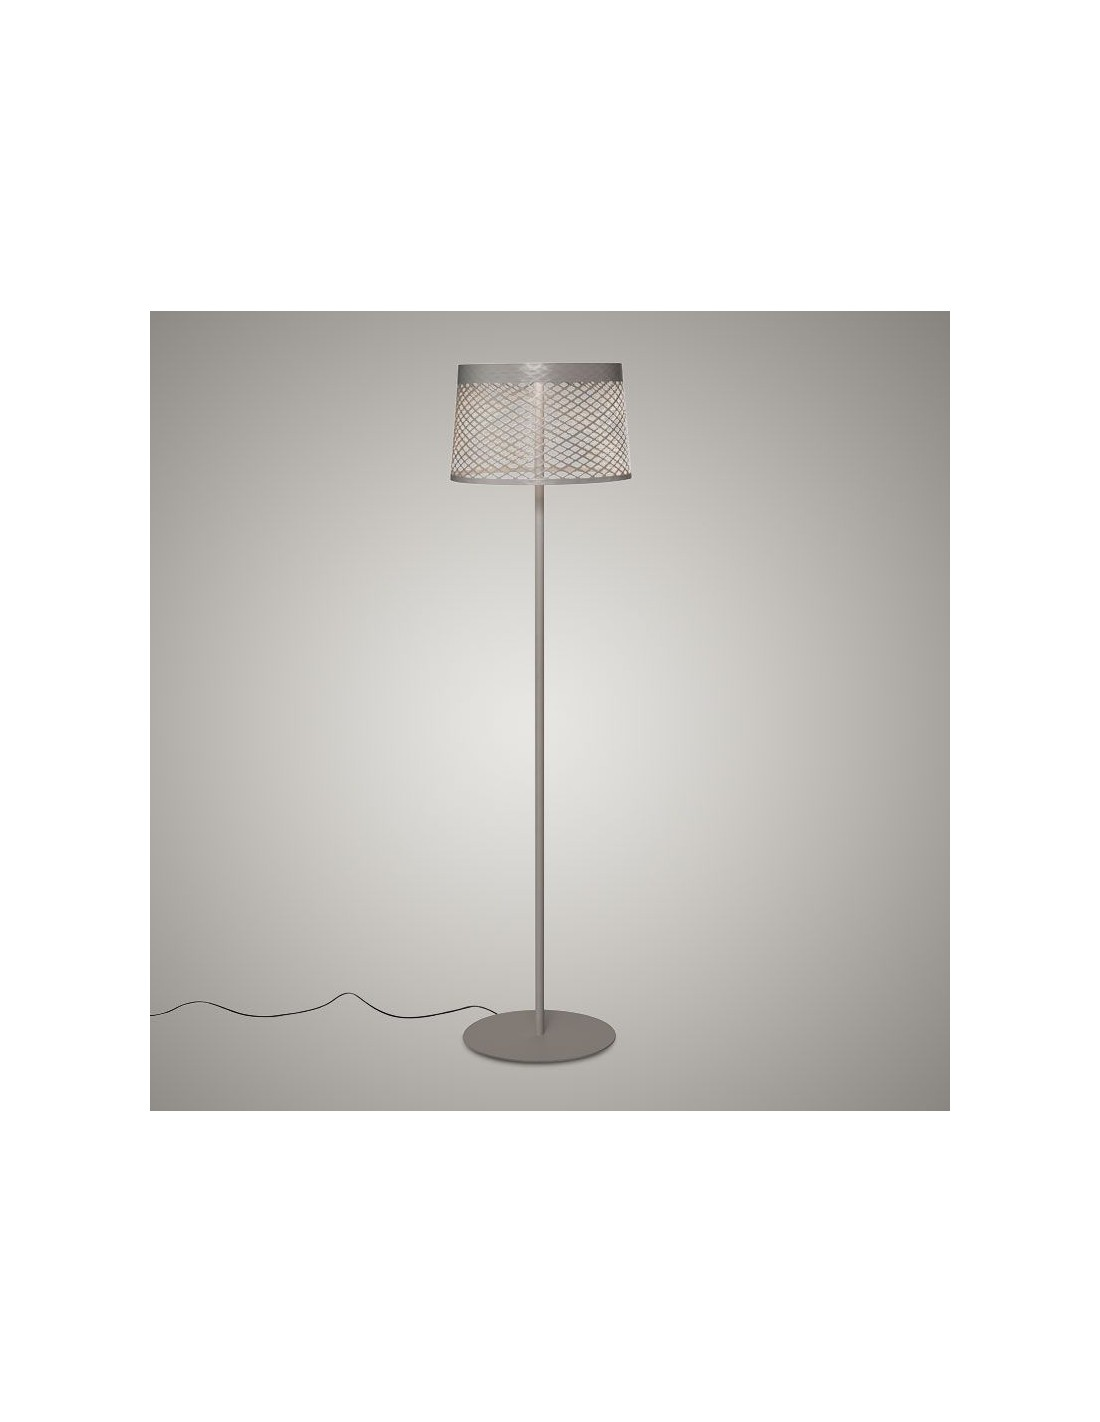 Lampadaire Twiggy Grid Lettura greige - Valente Design